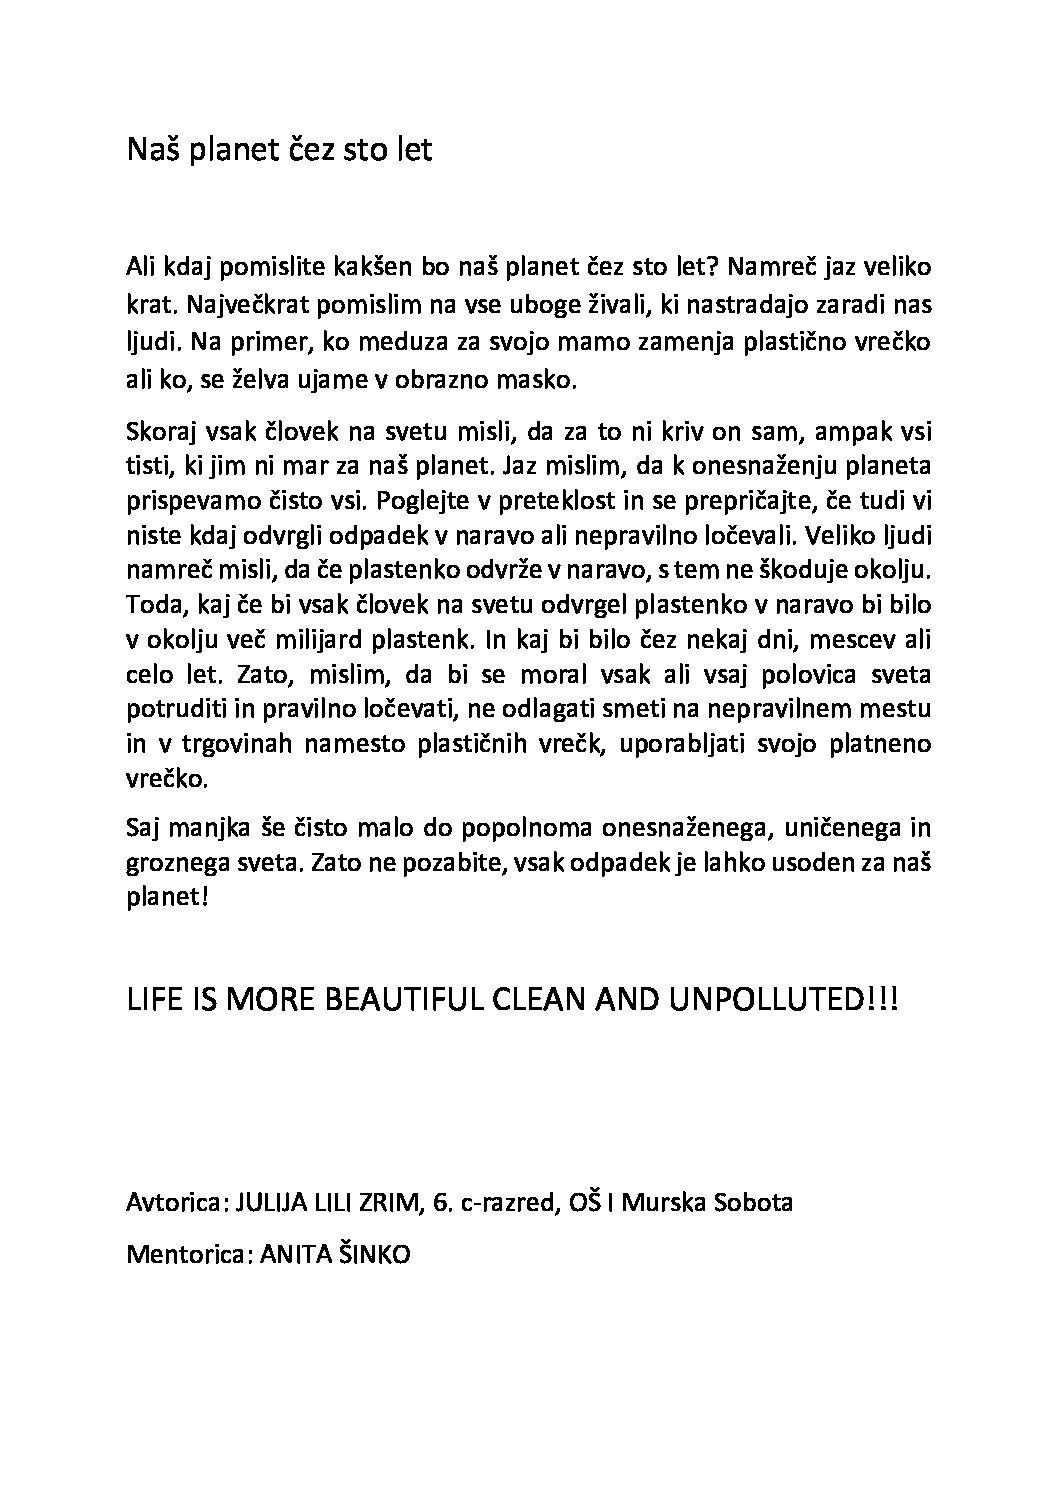 Julija Lili Zim: Naš planet čez 100 let